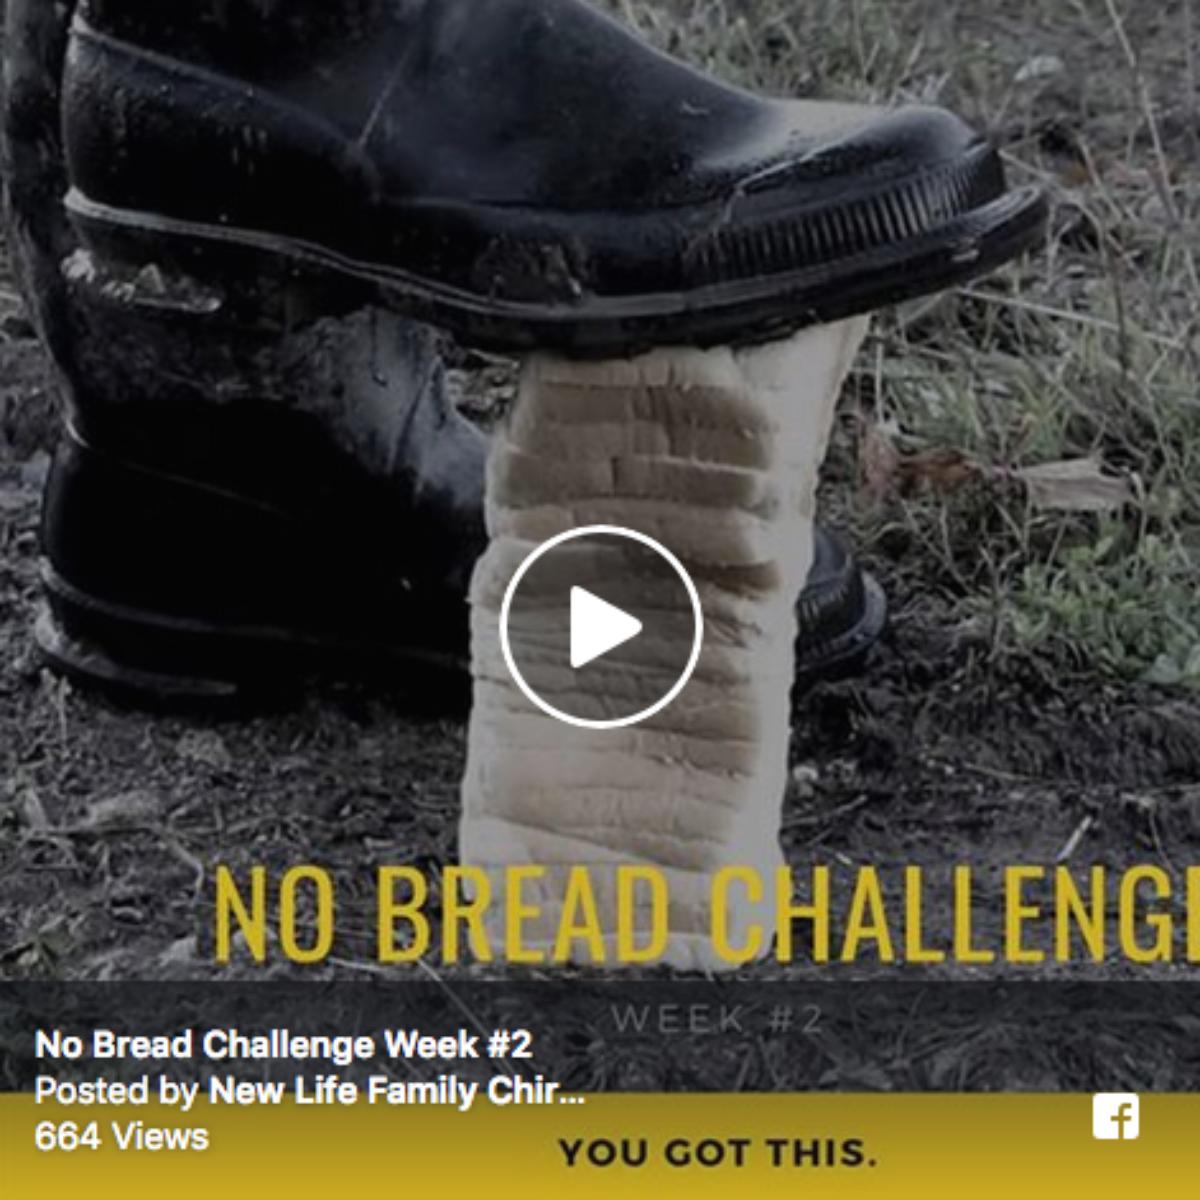 No Bread Challenge Week #2